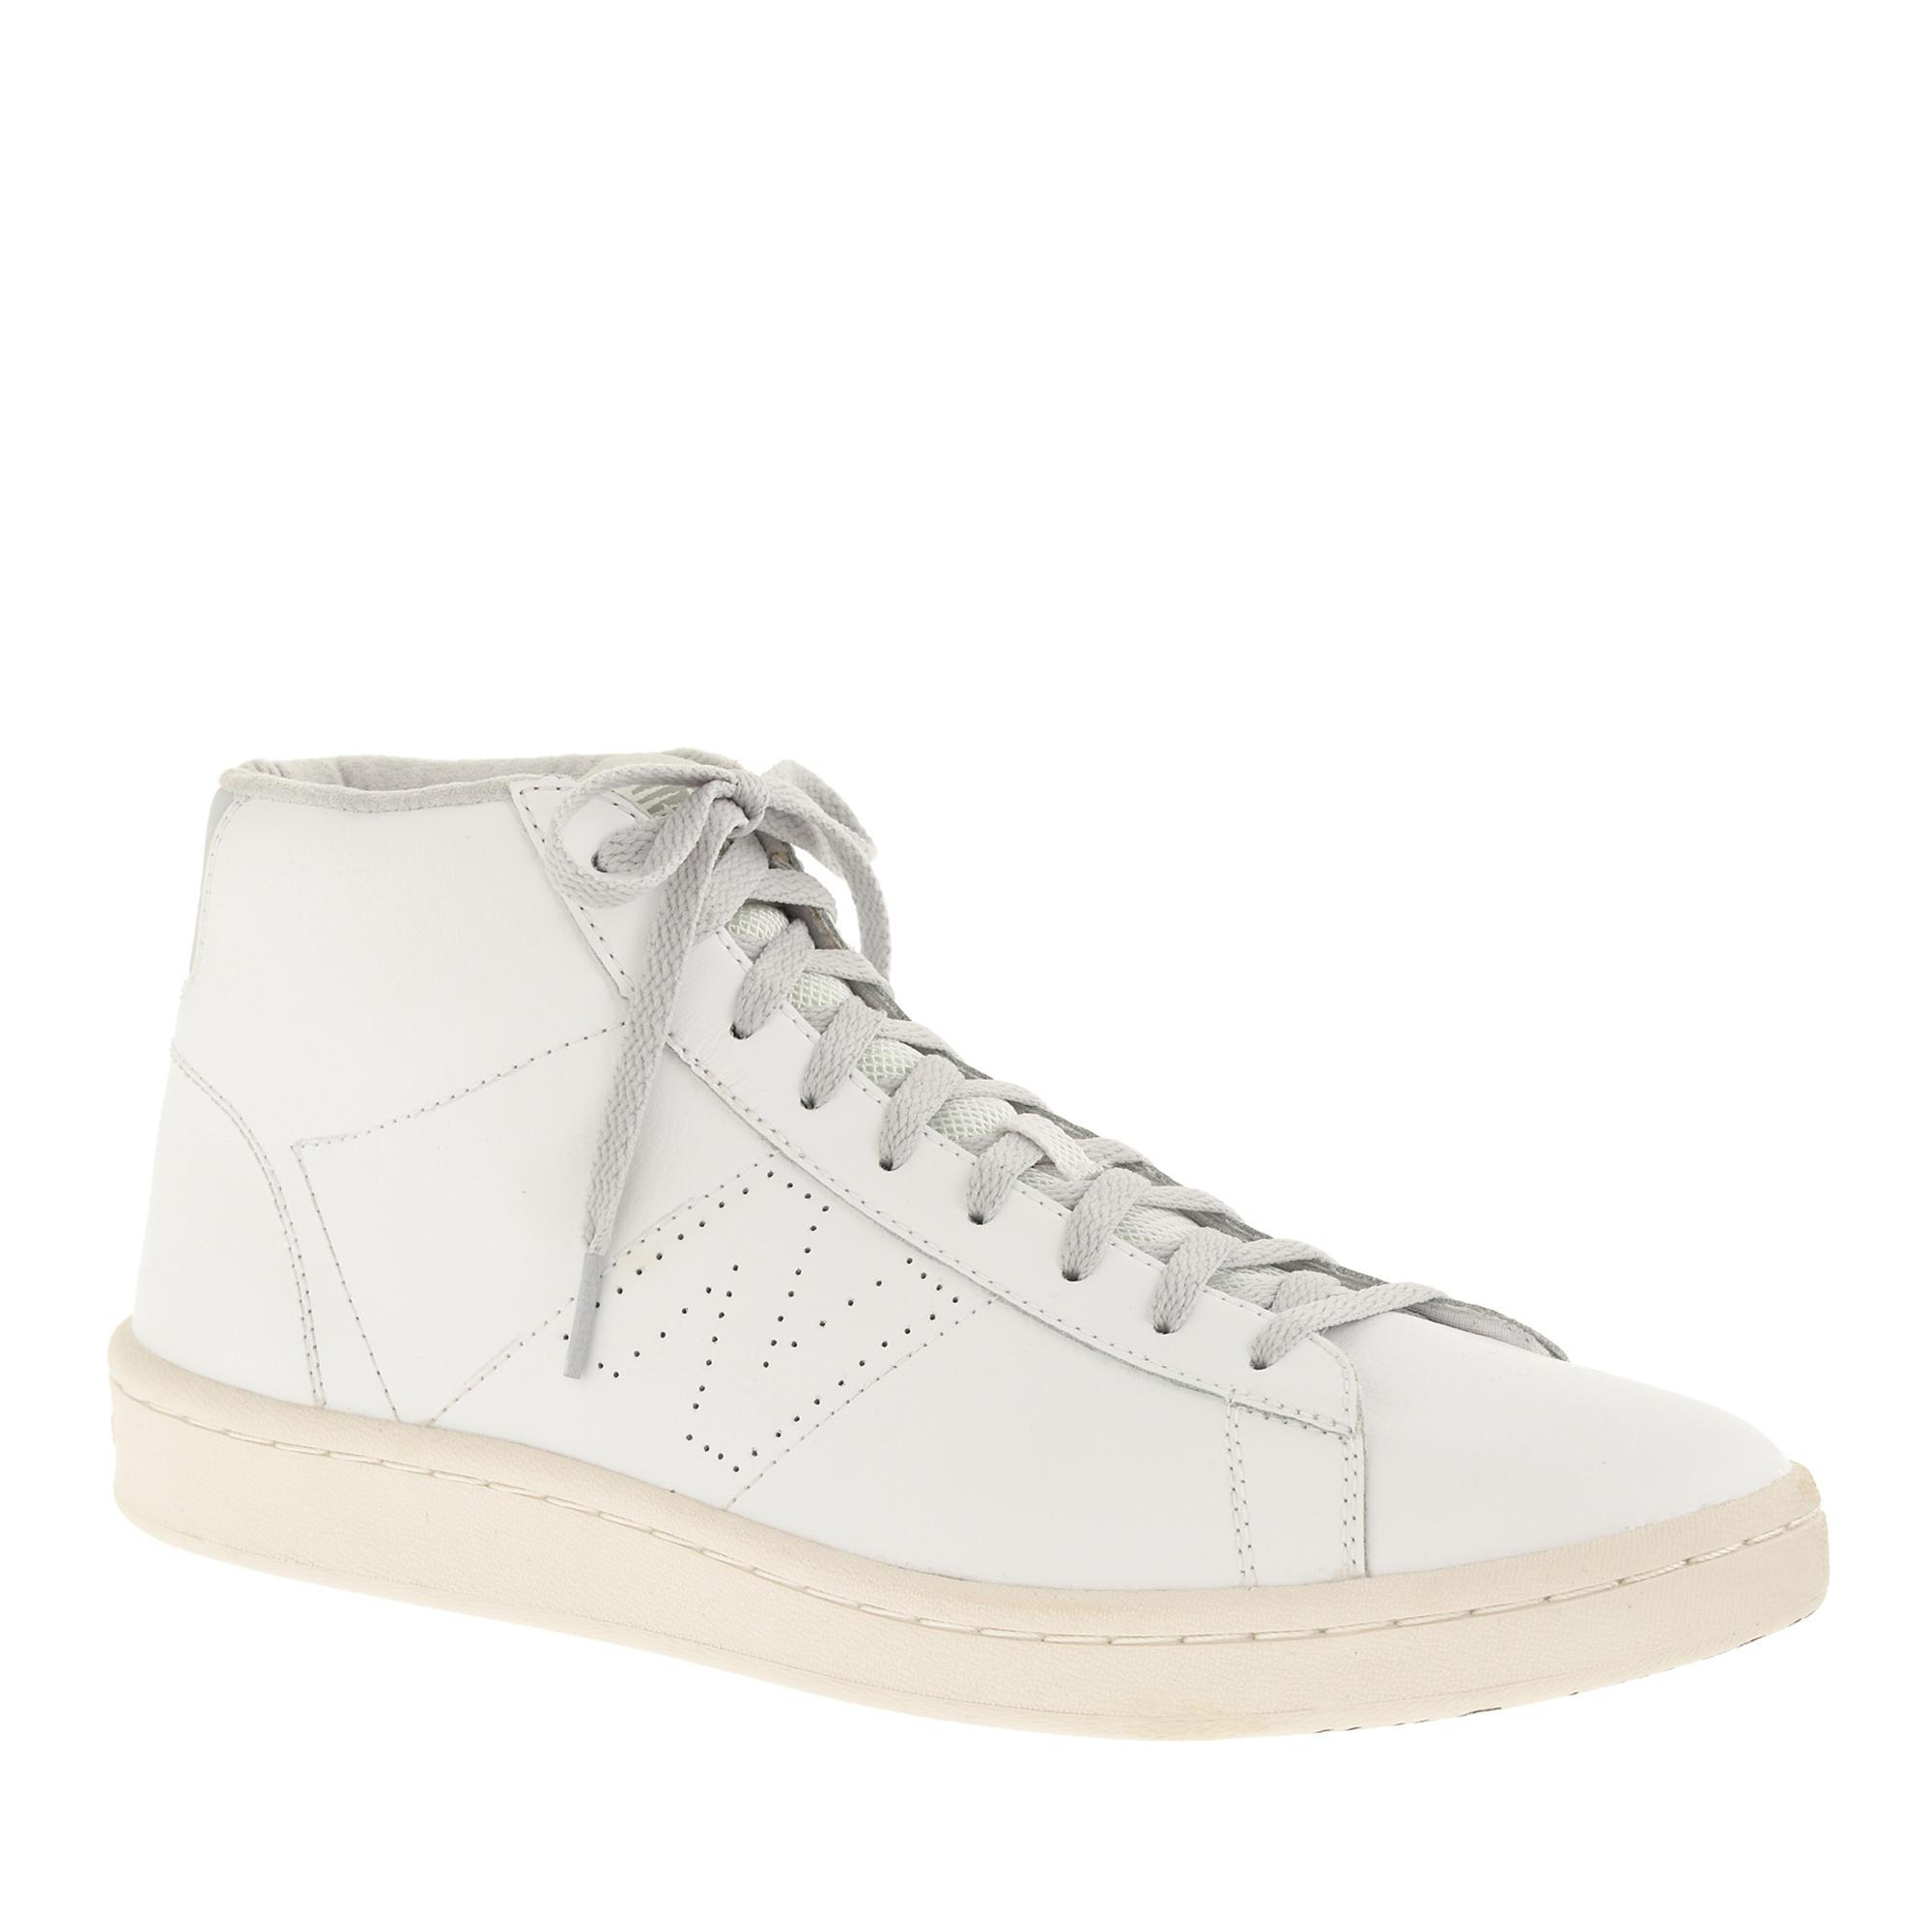 J.Crew New Balance 891 Leather Sneakers